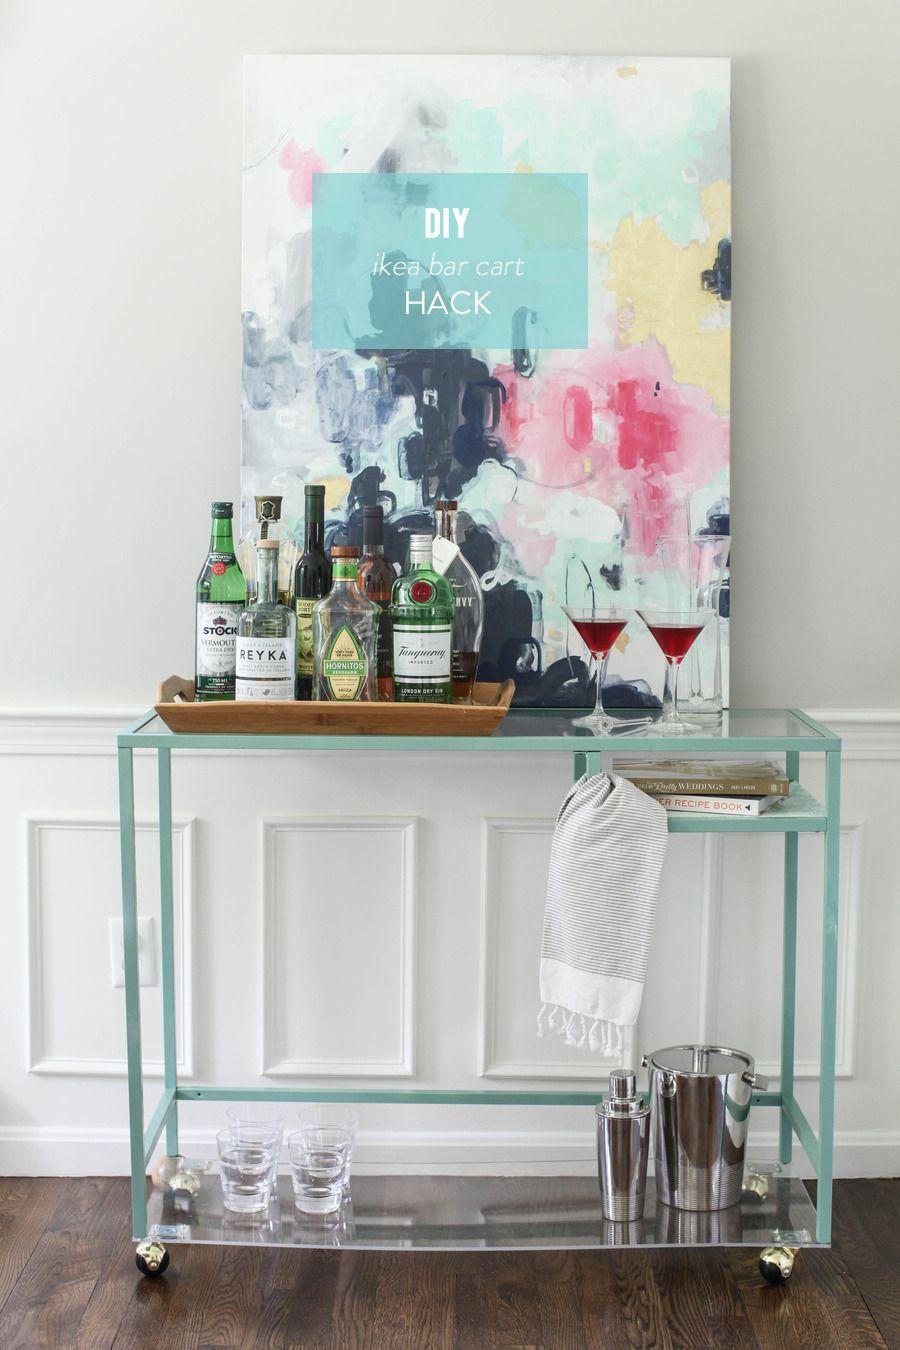 diy ikea bar cart hack tray cool ikea peinture maison mobilier rh pinterest fr